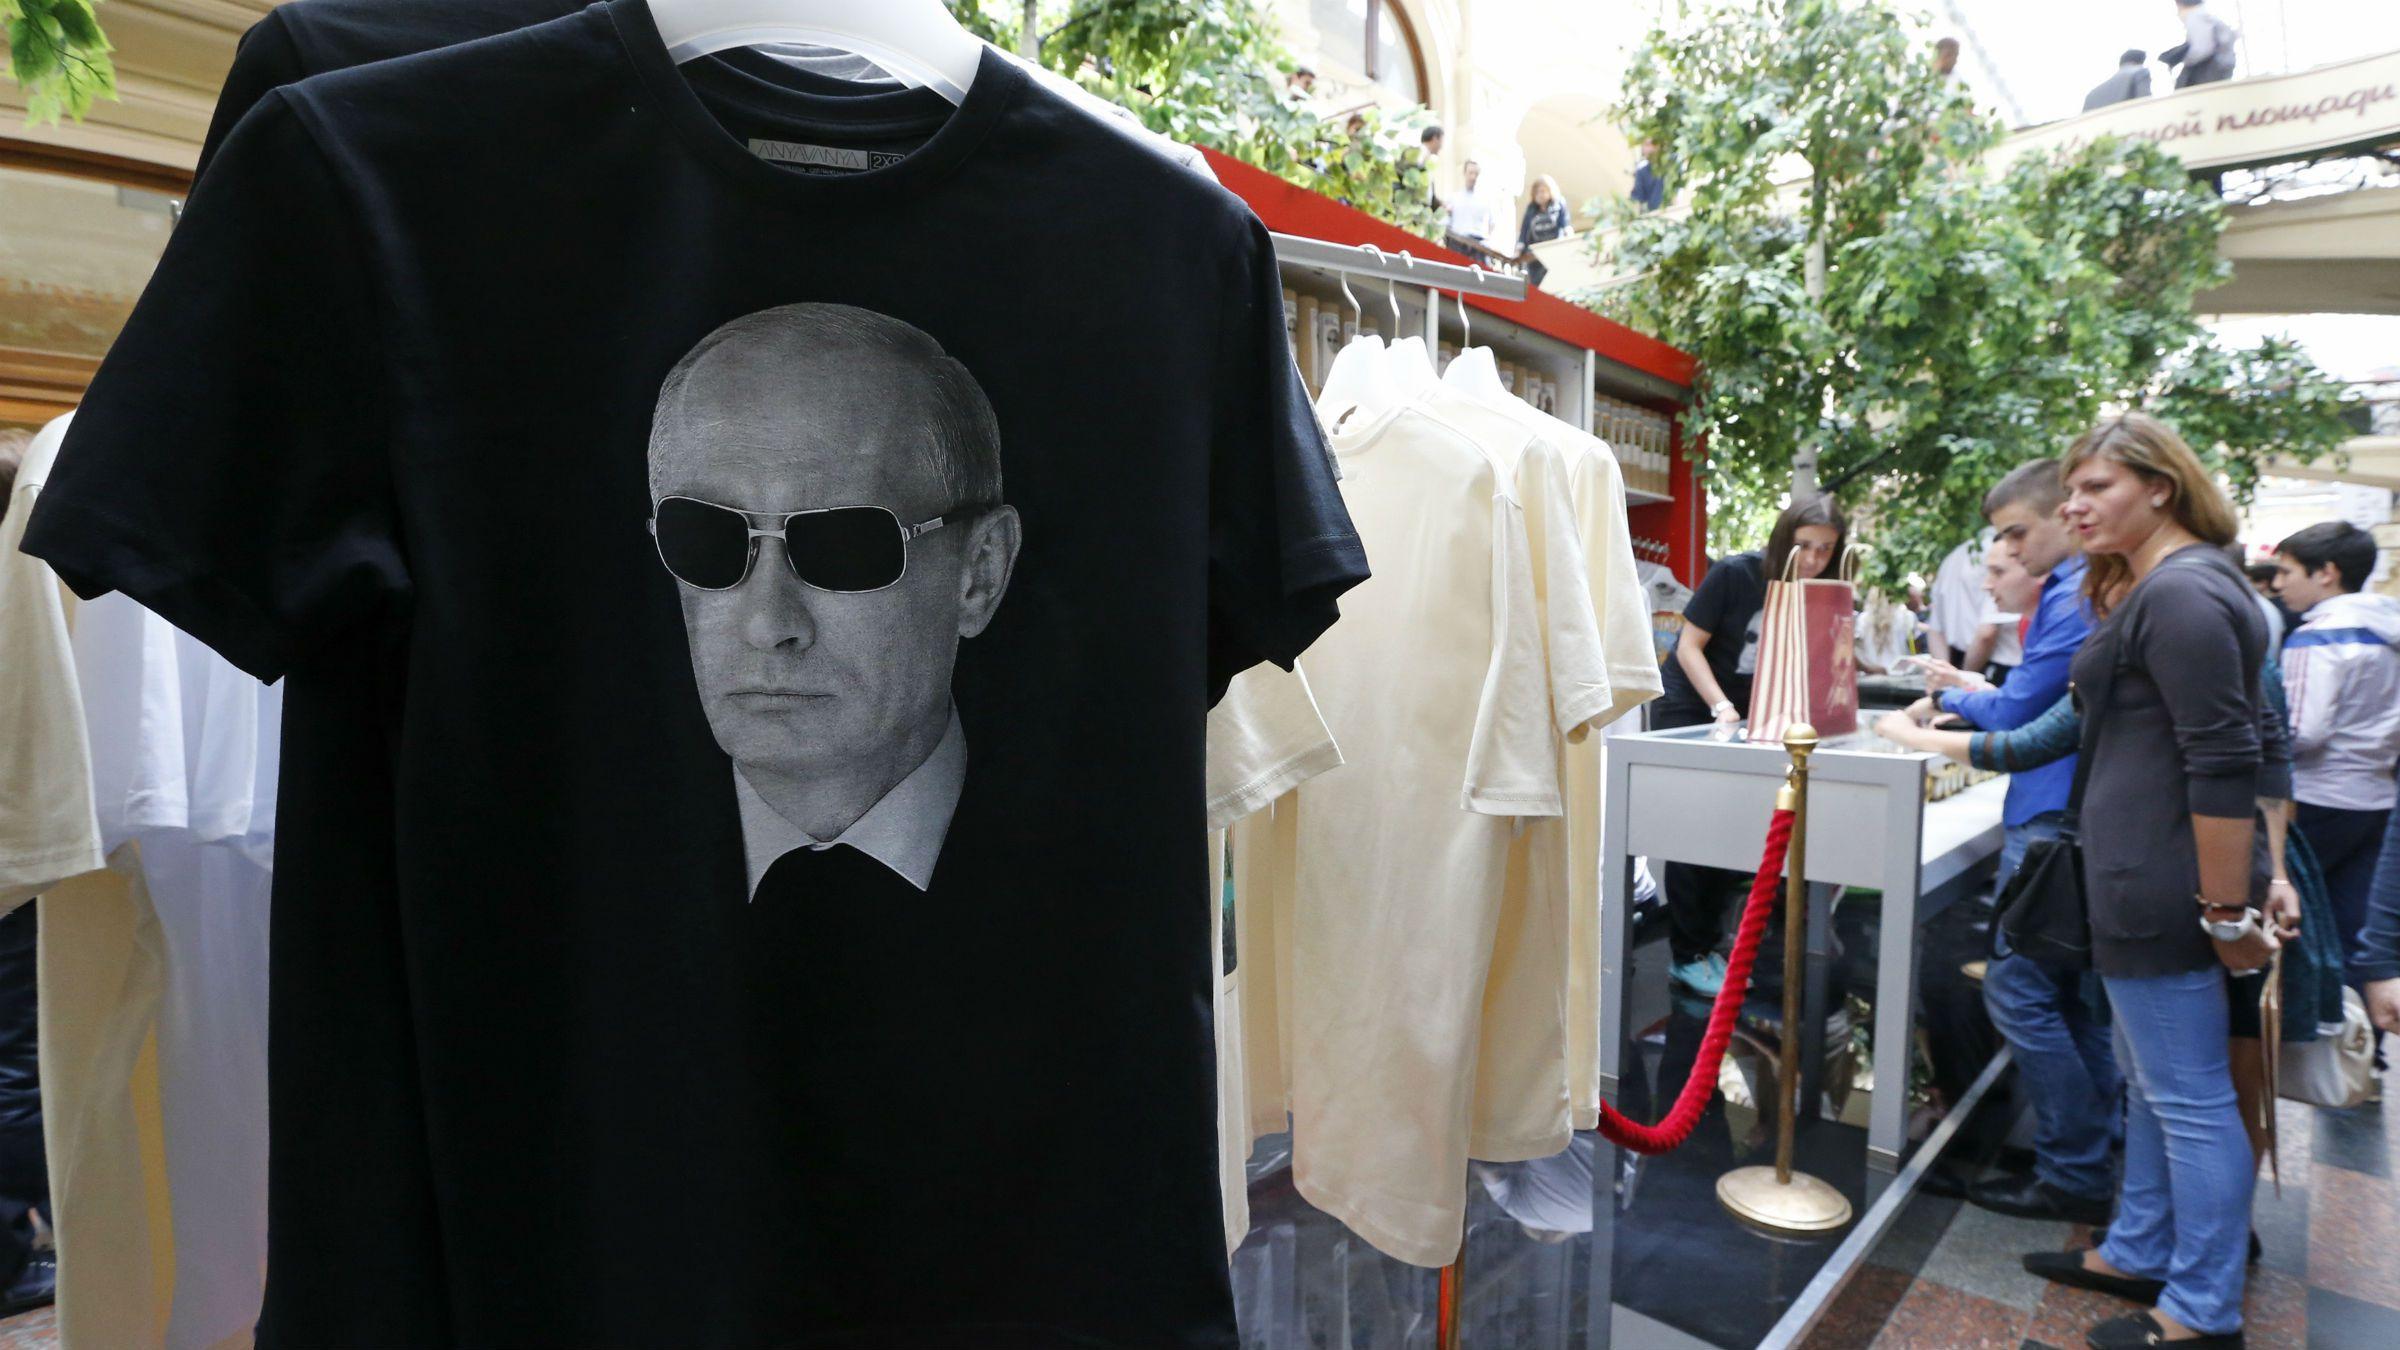 Putin t-shirt